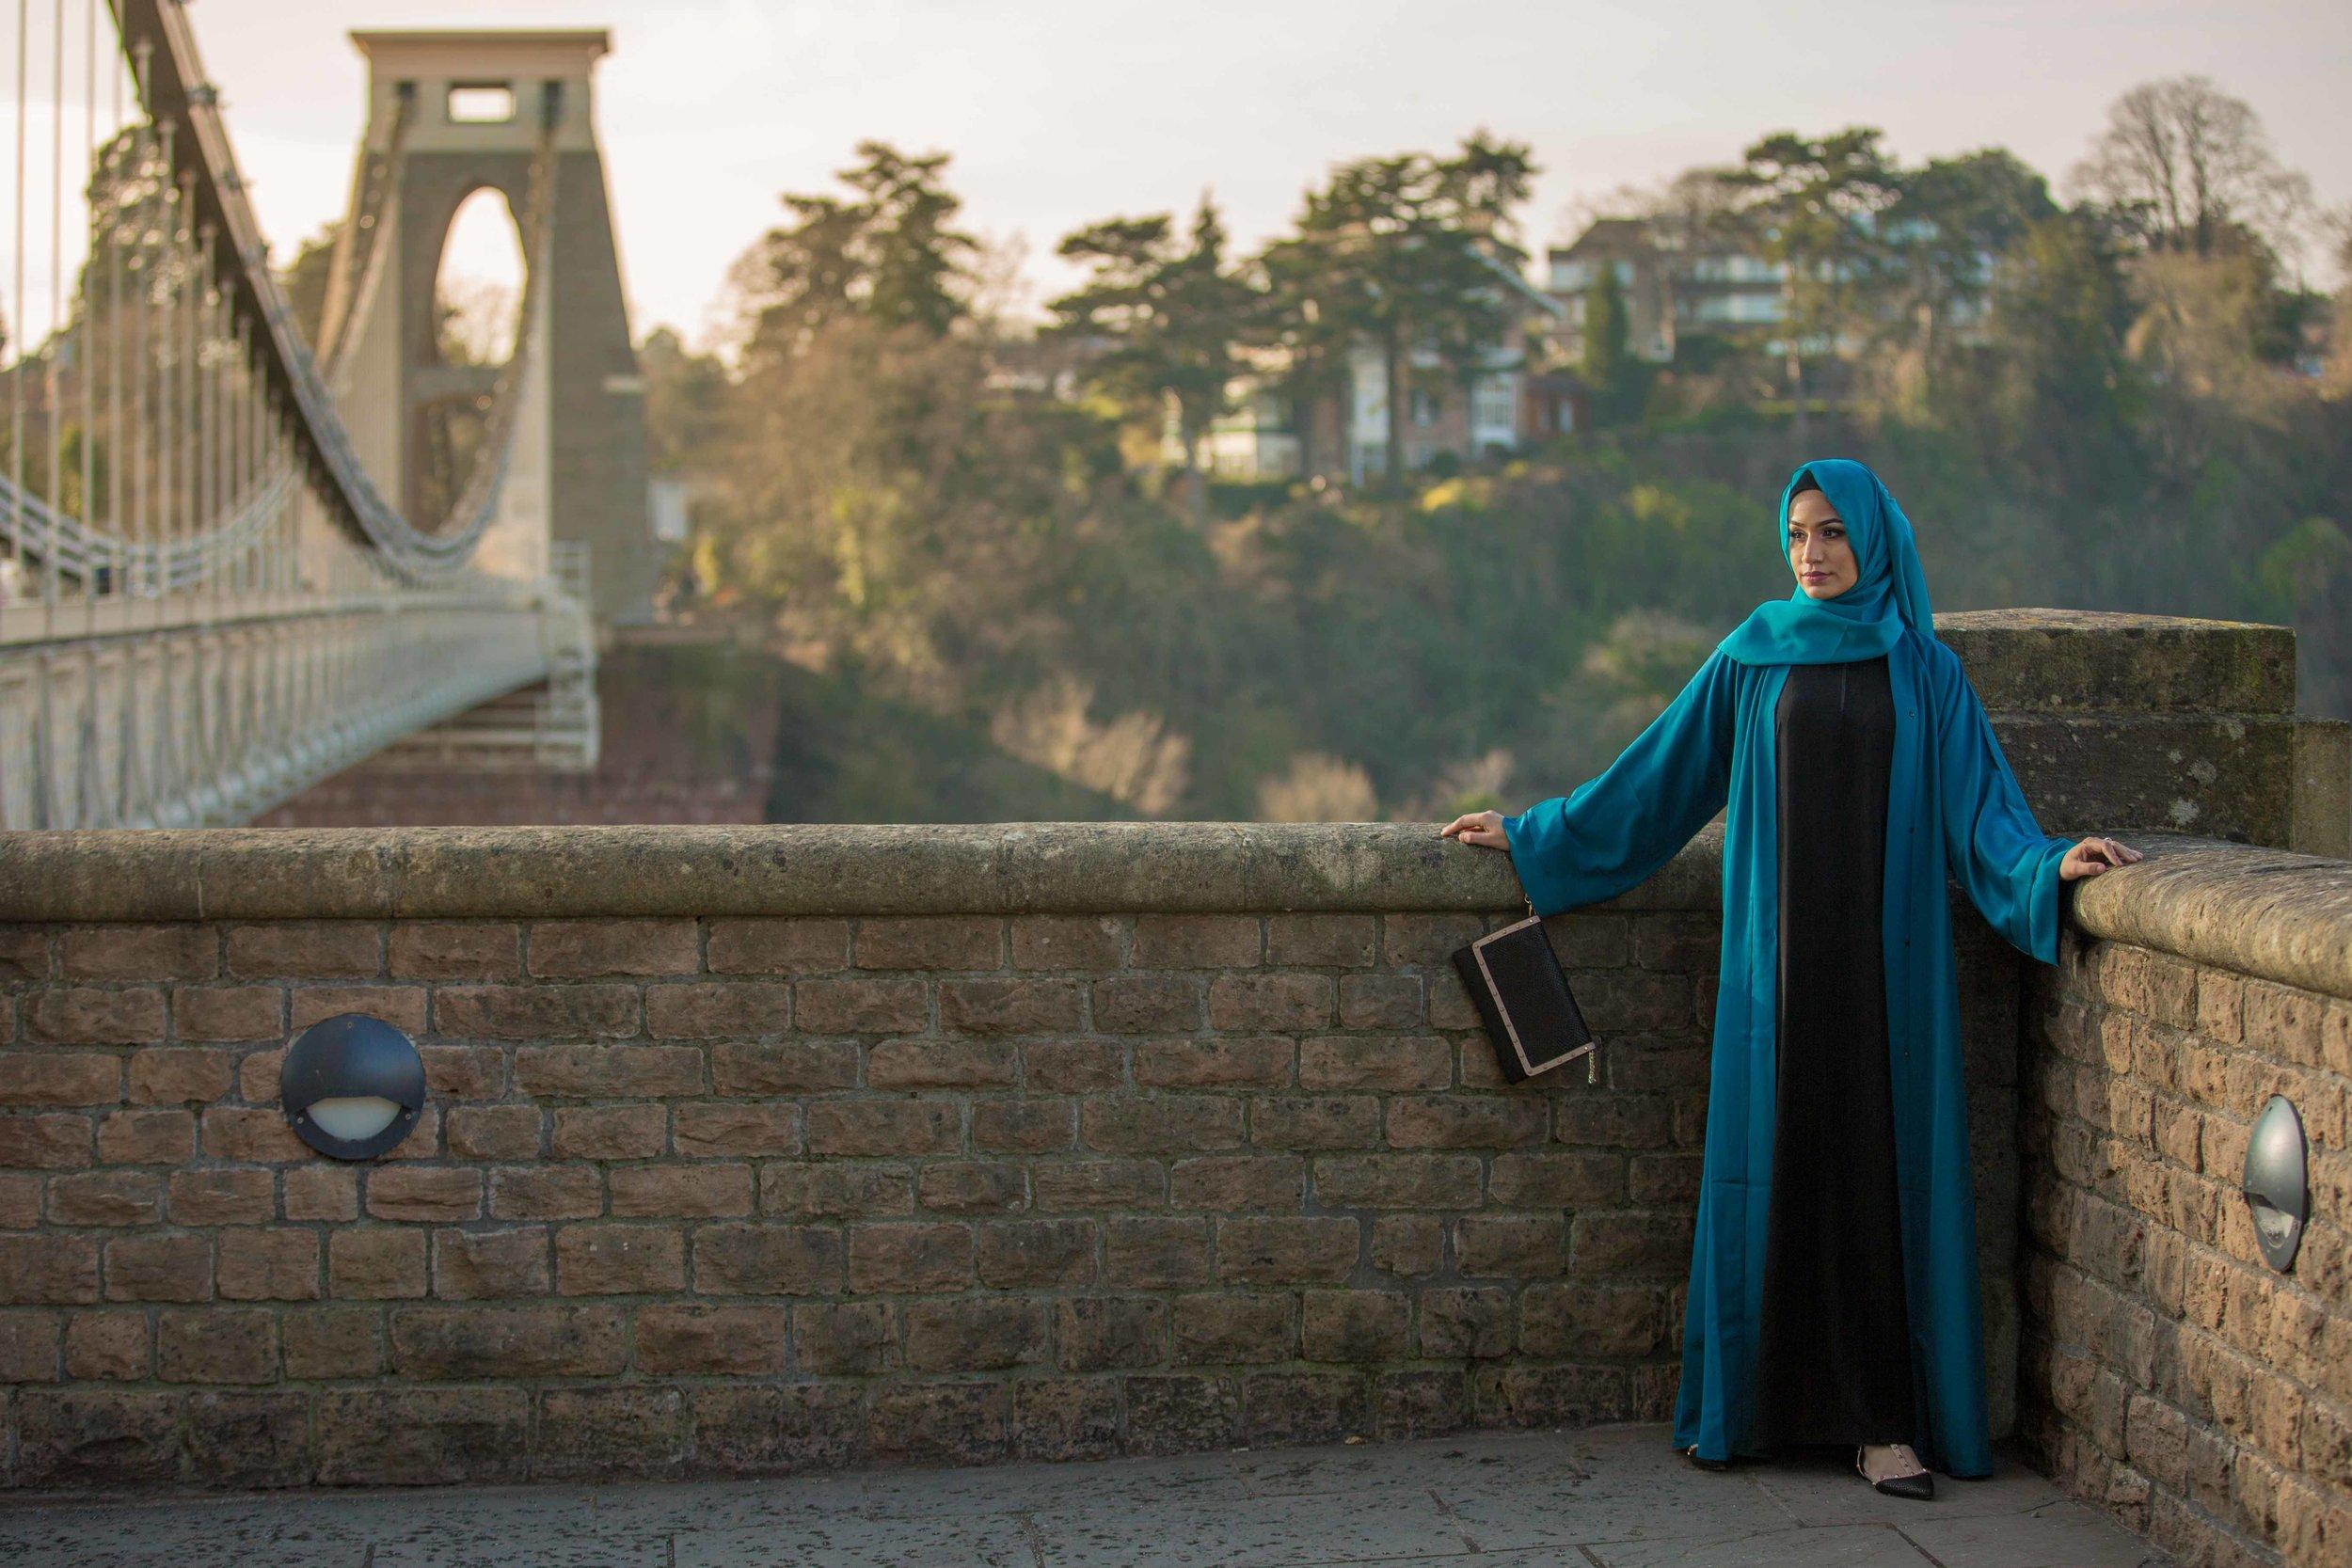 suspension-bridge-modest-street-aisha-rahman-fashion-photography-london-bristol-natalia-smith-photography-20.jpg